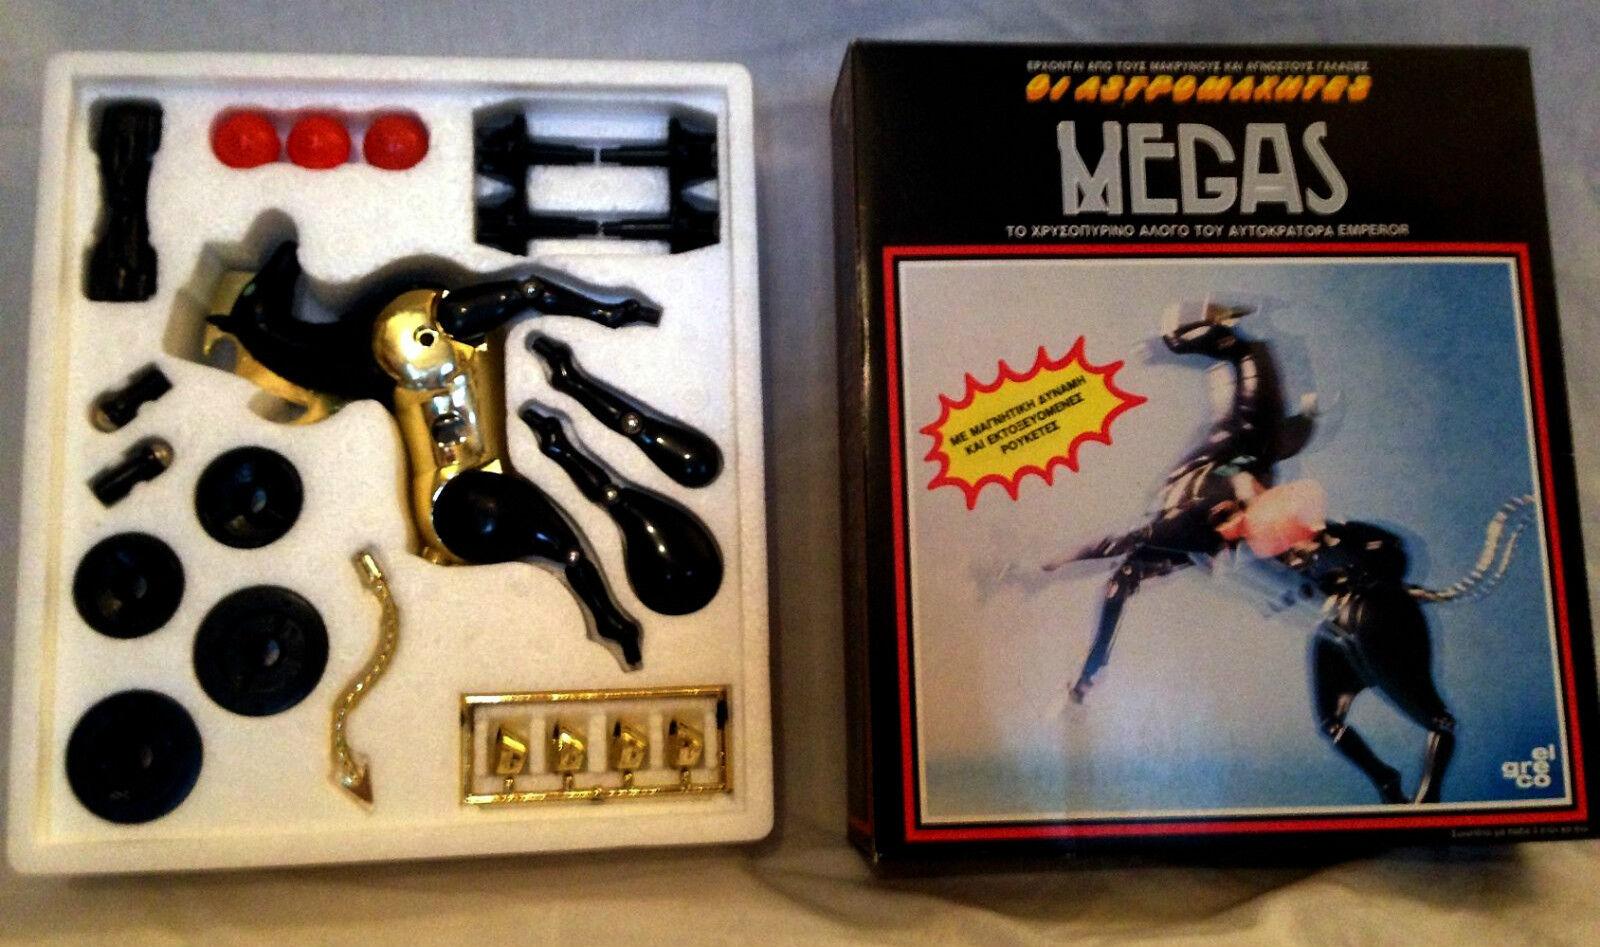 NEW Vintage Mego El El El Gre Co Greek version Micronauts MEGAS MIB Free Shipping RARE a98f65